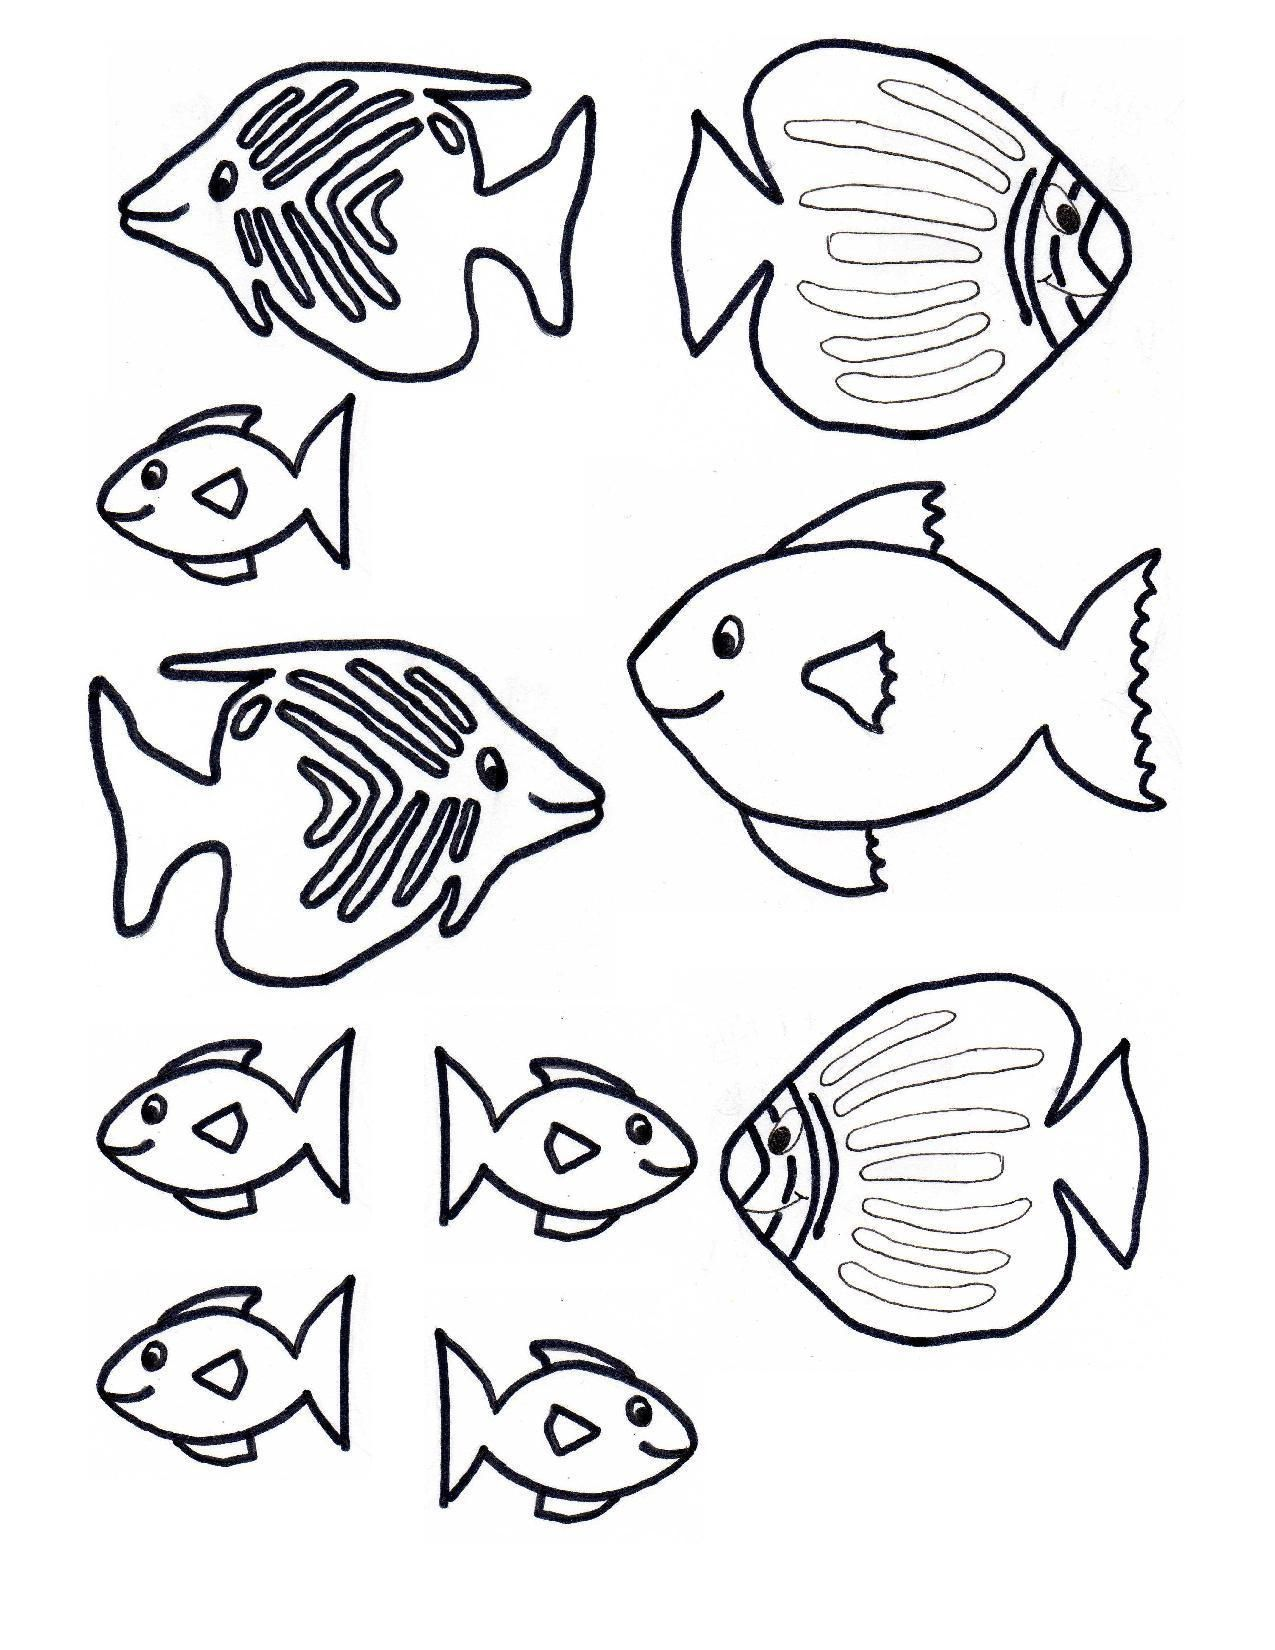 Aquarium Worksheets Kindergarten Fish Template Fish Coloring Page Coloring Pages